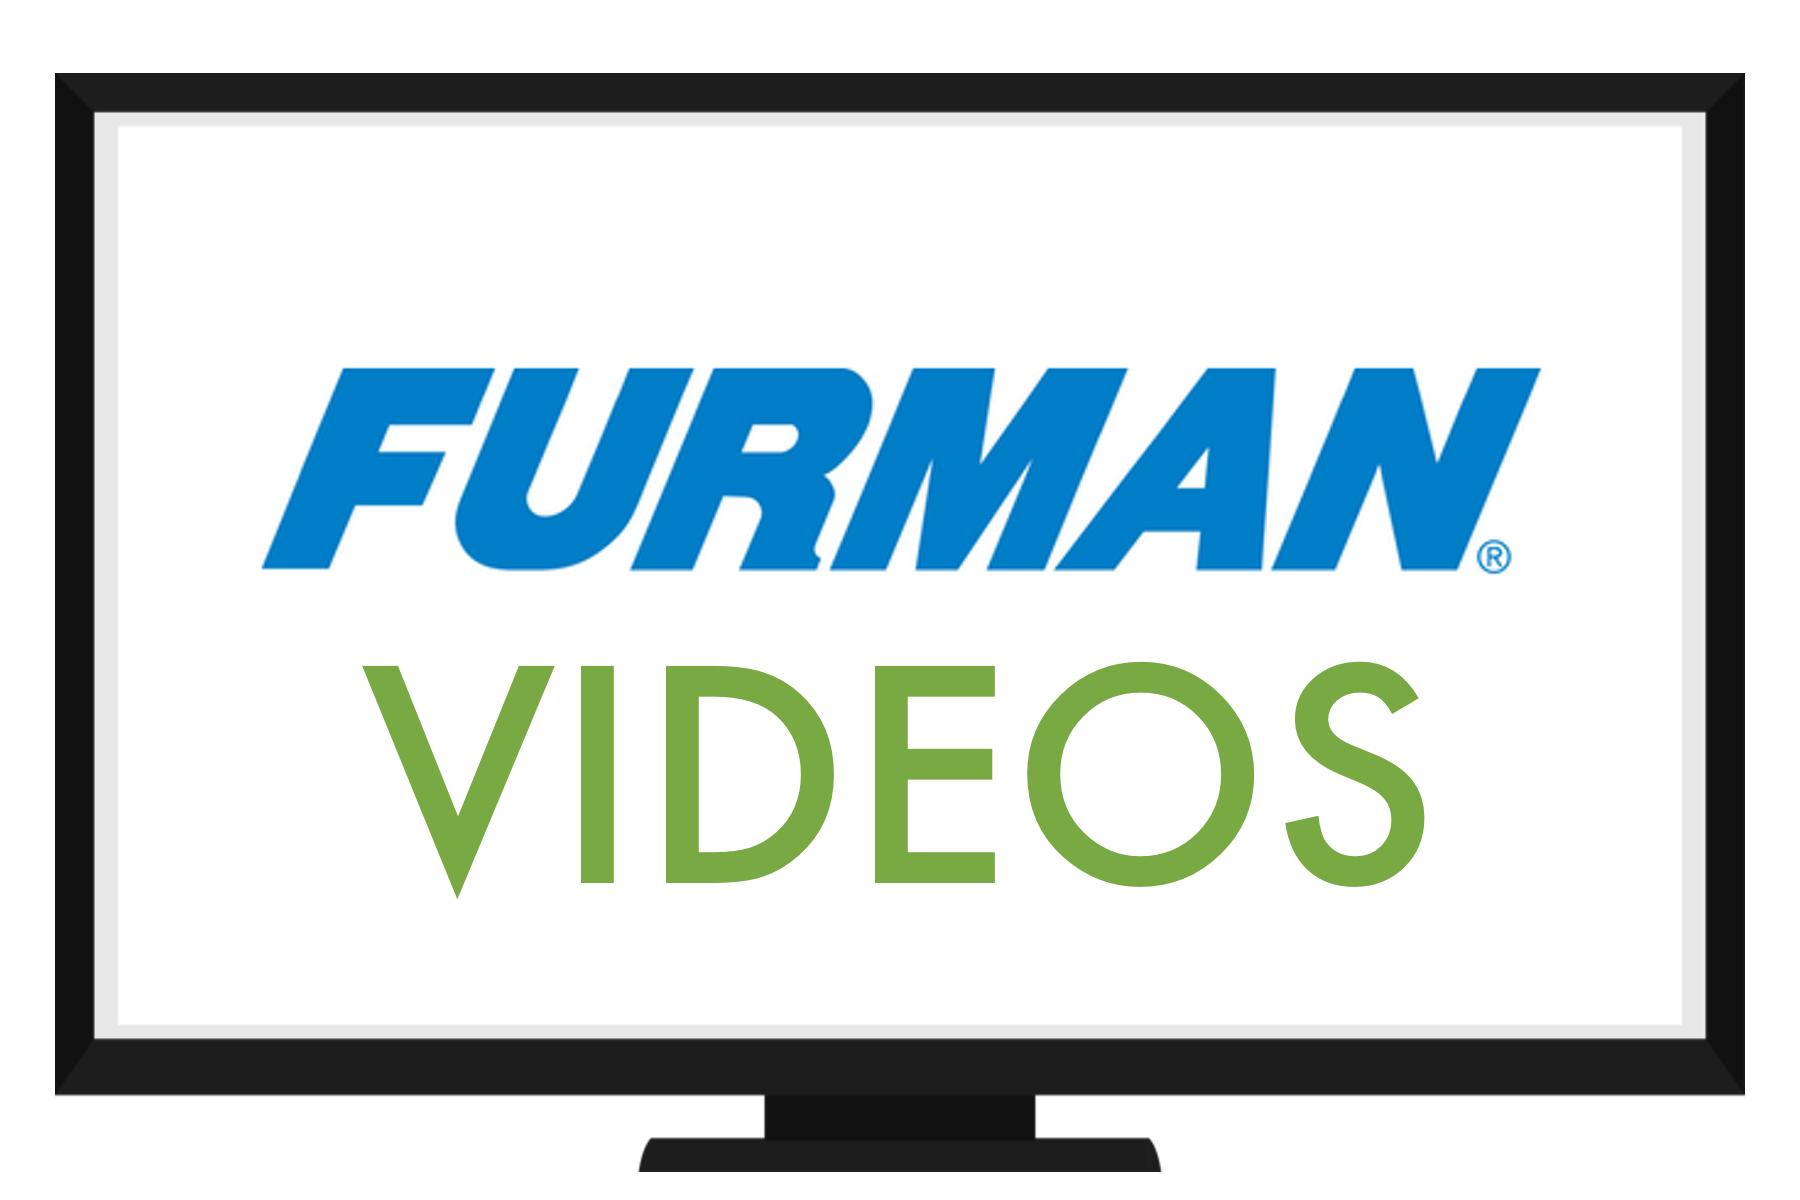 Furman Videos.png